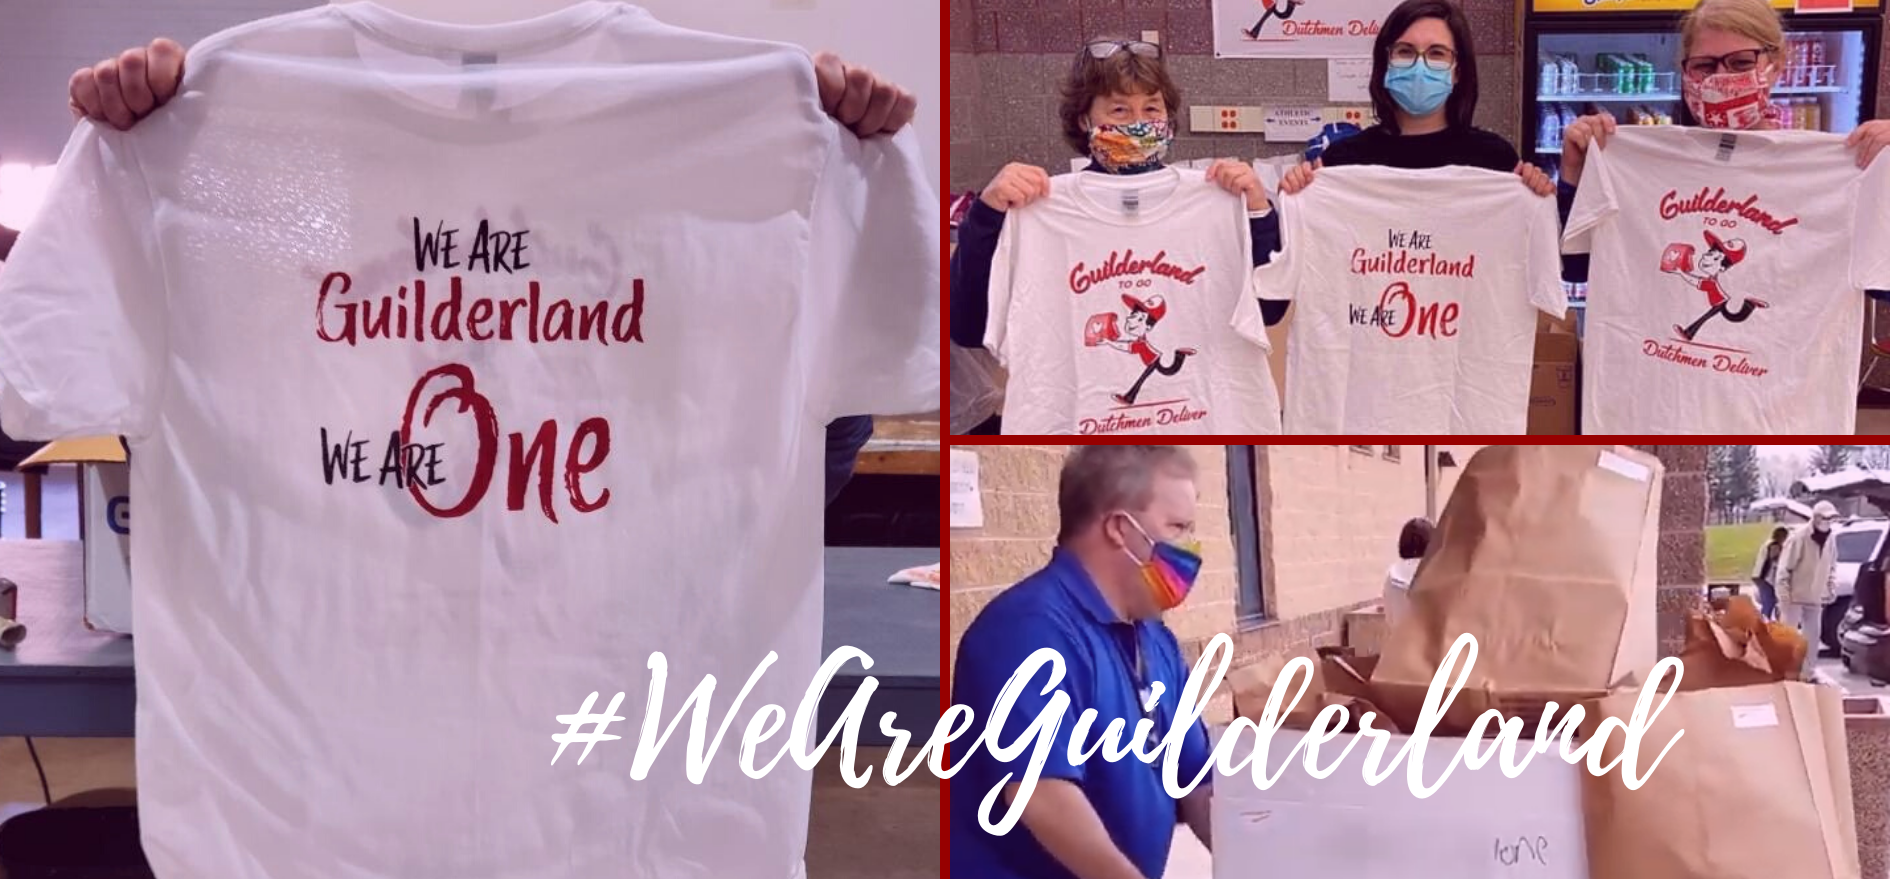 #WeAreGuilderland images of volunteers packing meals to be delivered